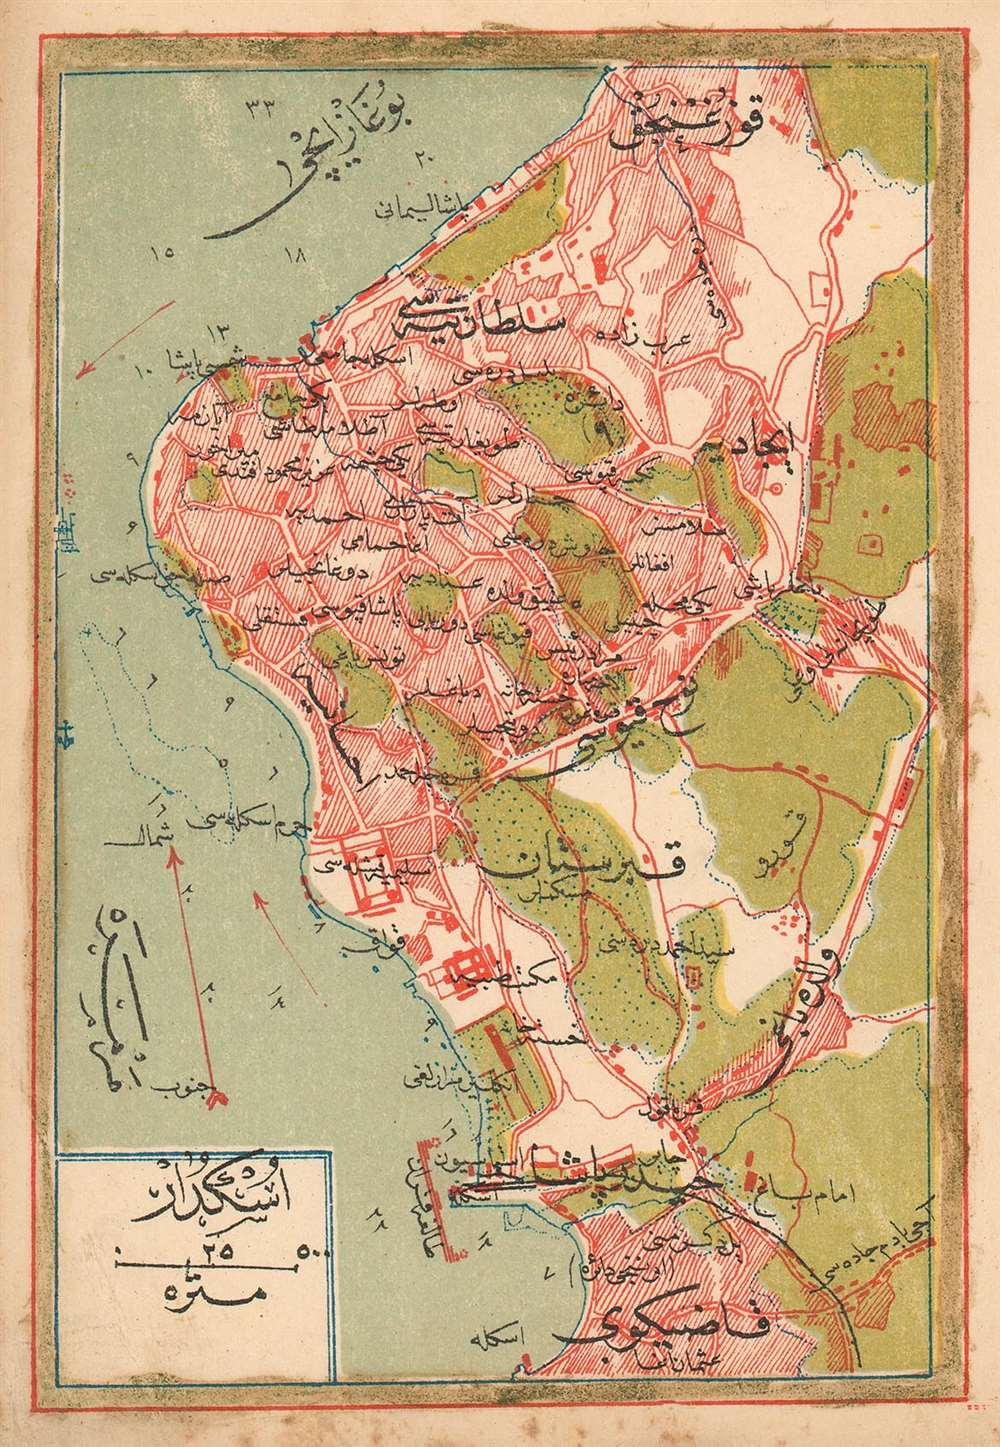 (Turkish Plan of Üsküdar)